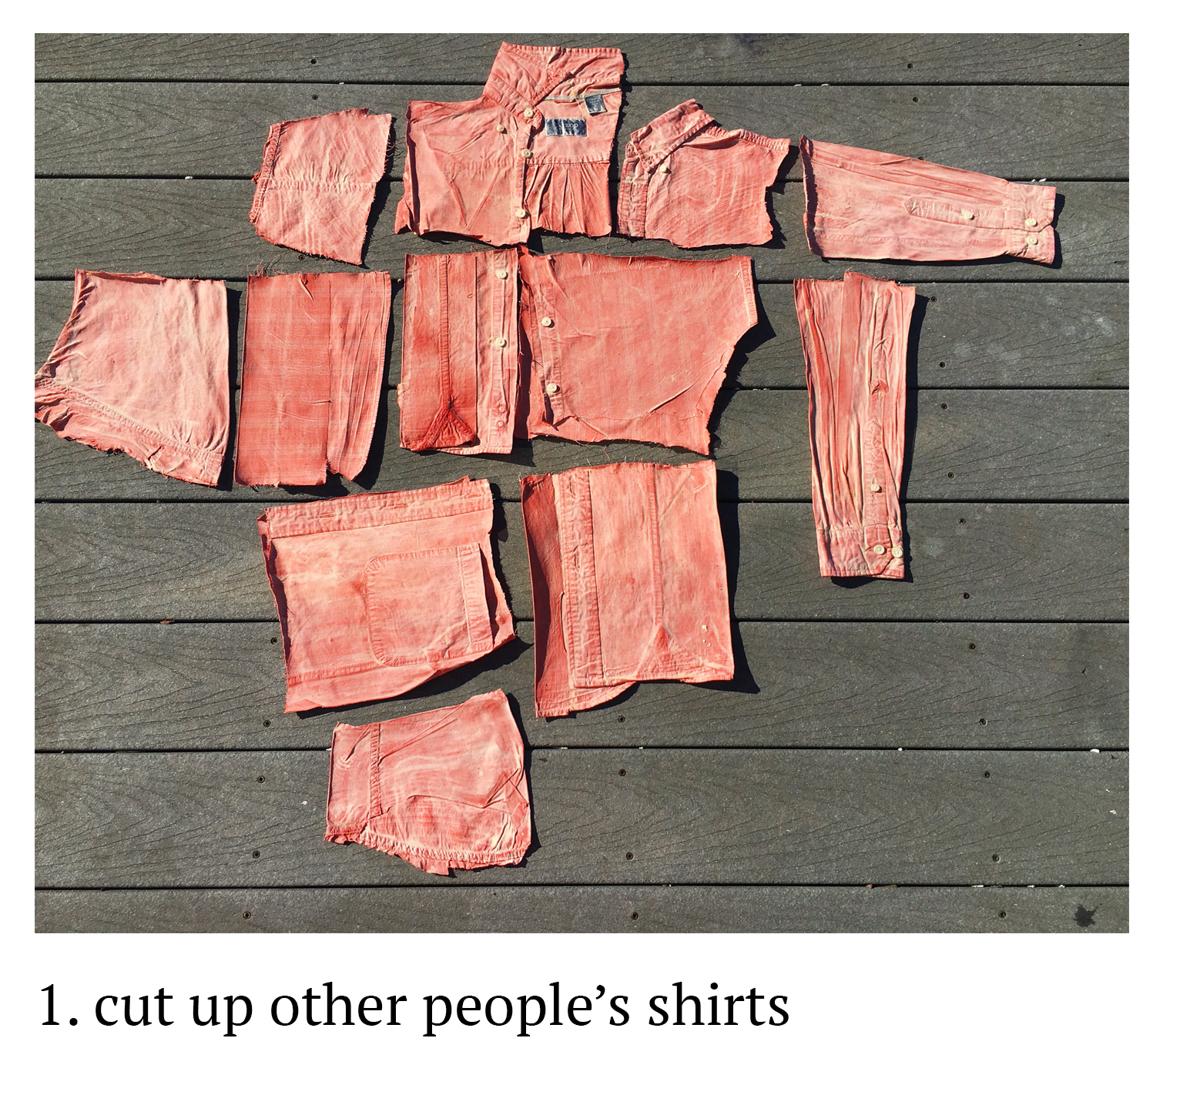 1. Cut up shirts (large view)